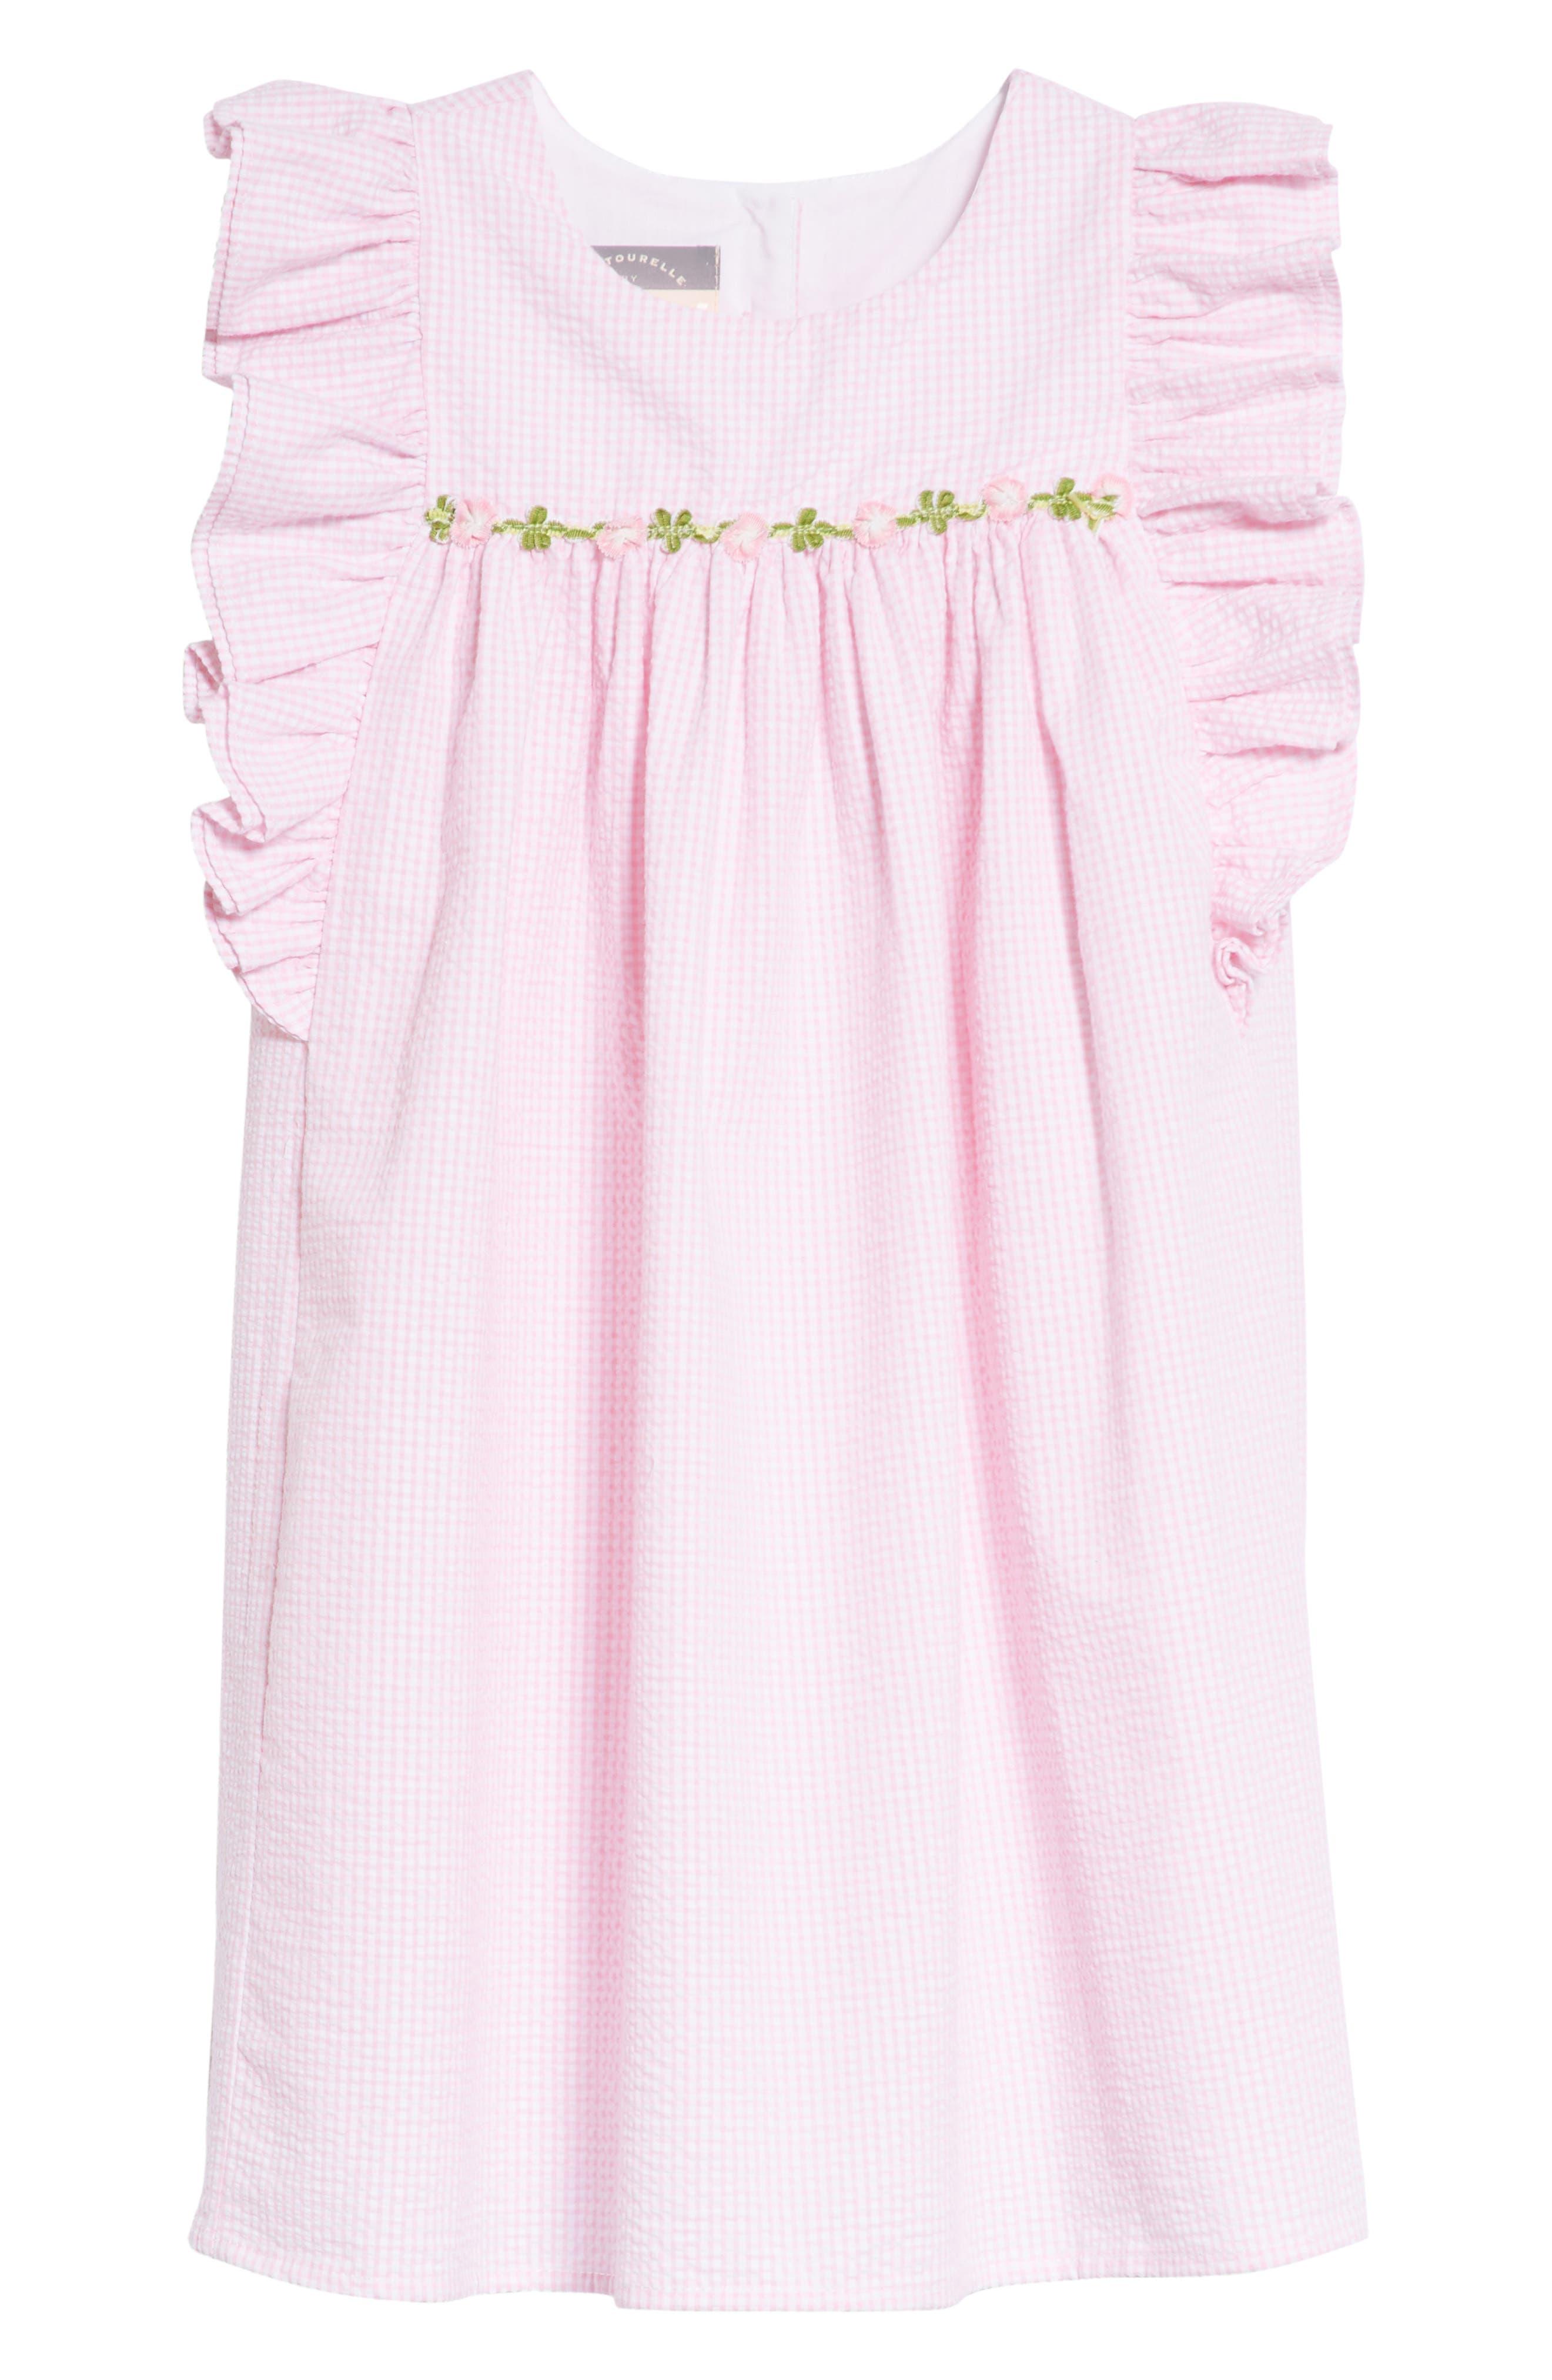 Seersucker Ruffle Sleeve Dress,                         Main,                         color,